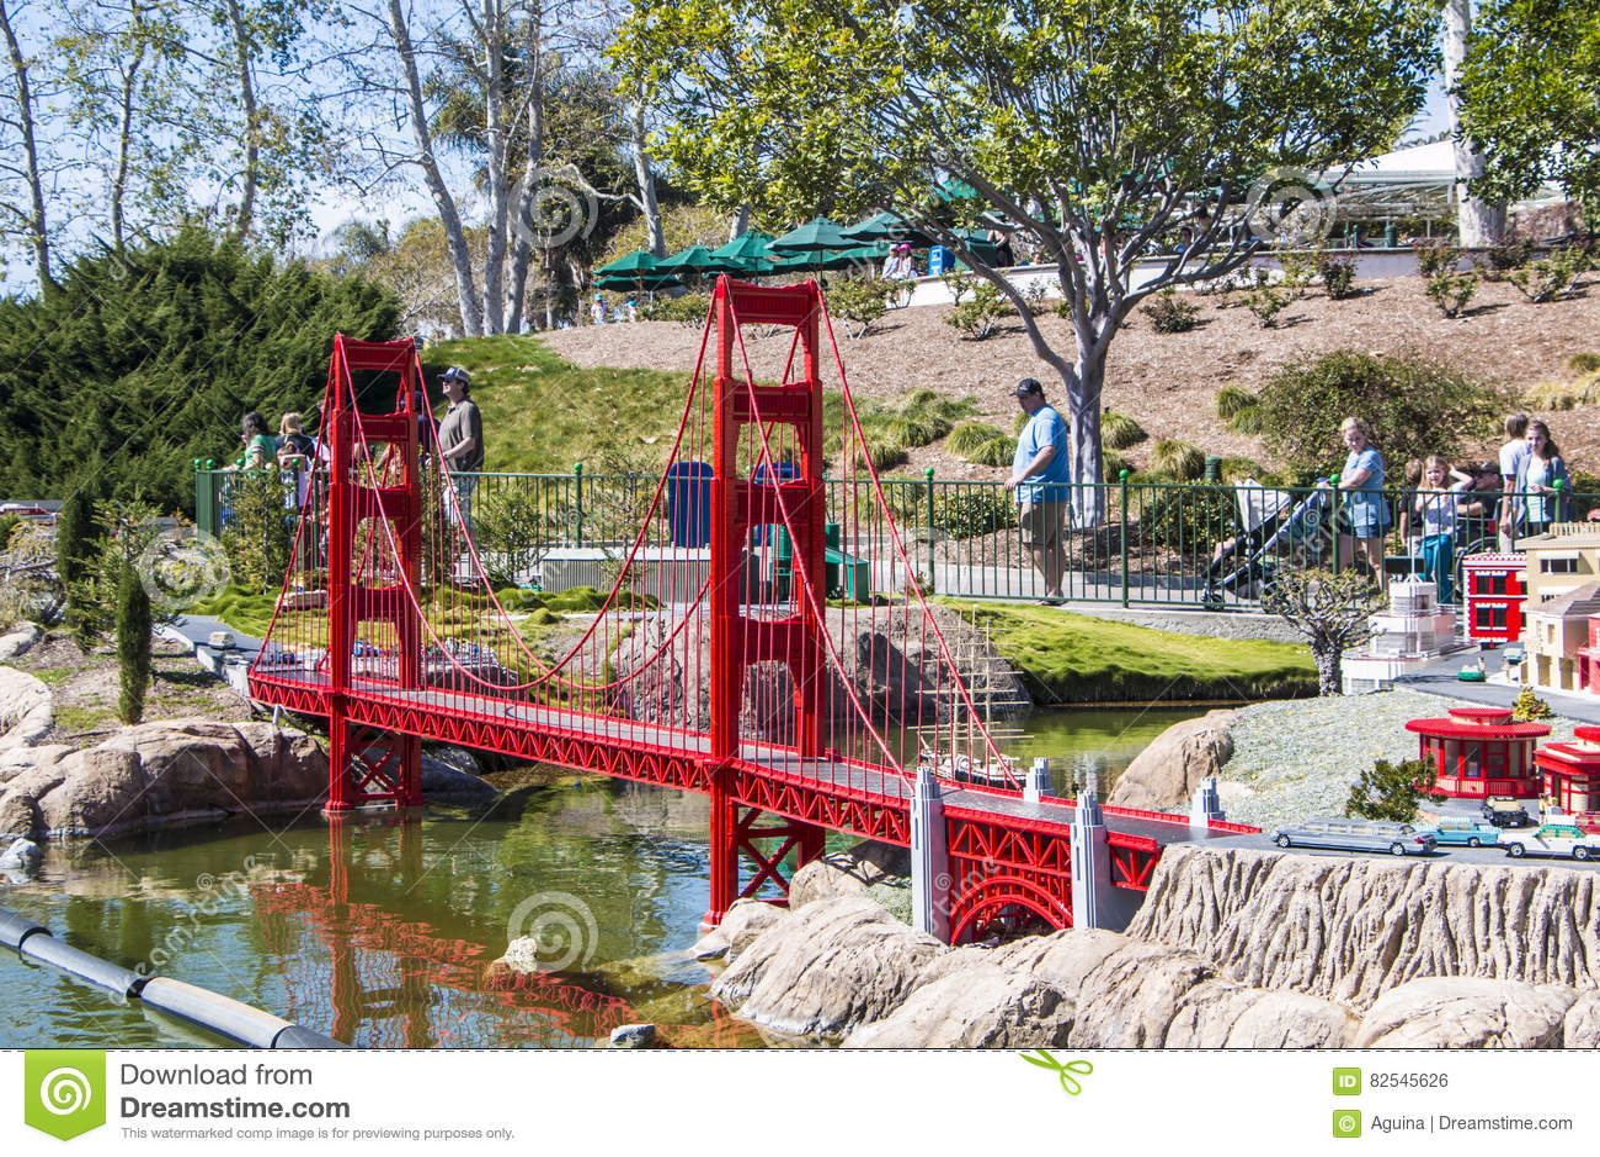 California coupons theme parks